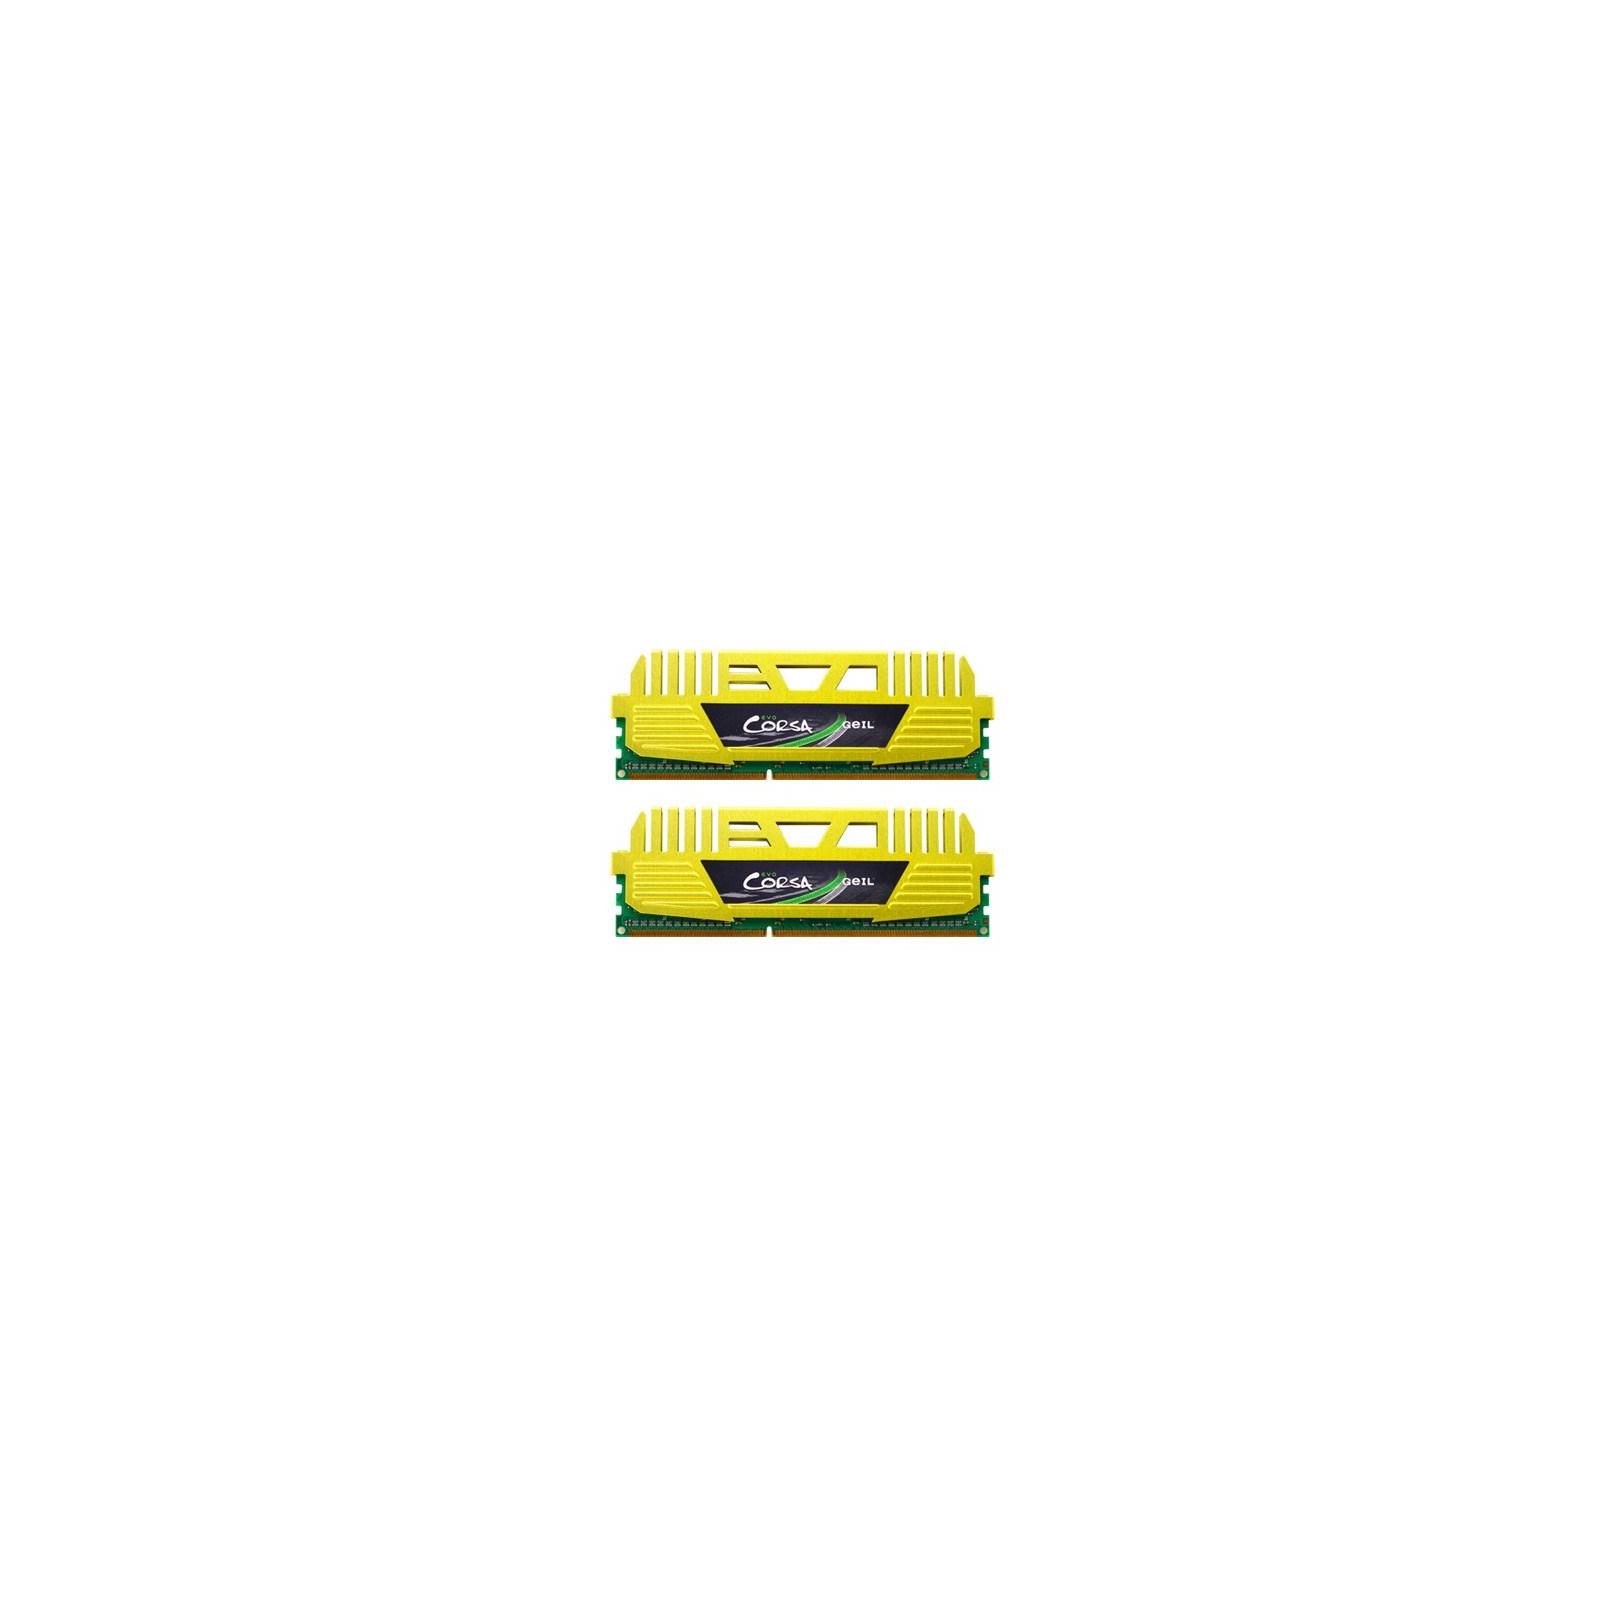 Модуль памяти для компьютера DDR3 8GB (2x4GB) 1866 MHz GEIL (GOC38GB1866C9DC)